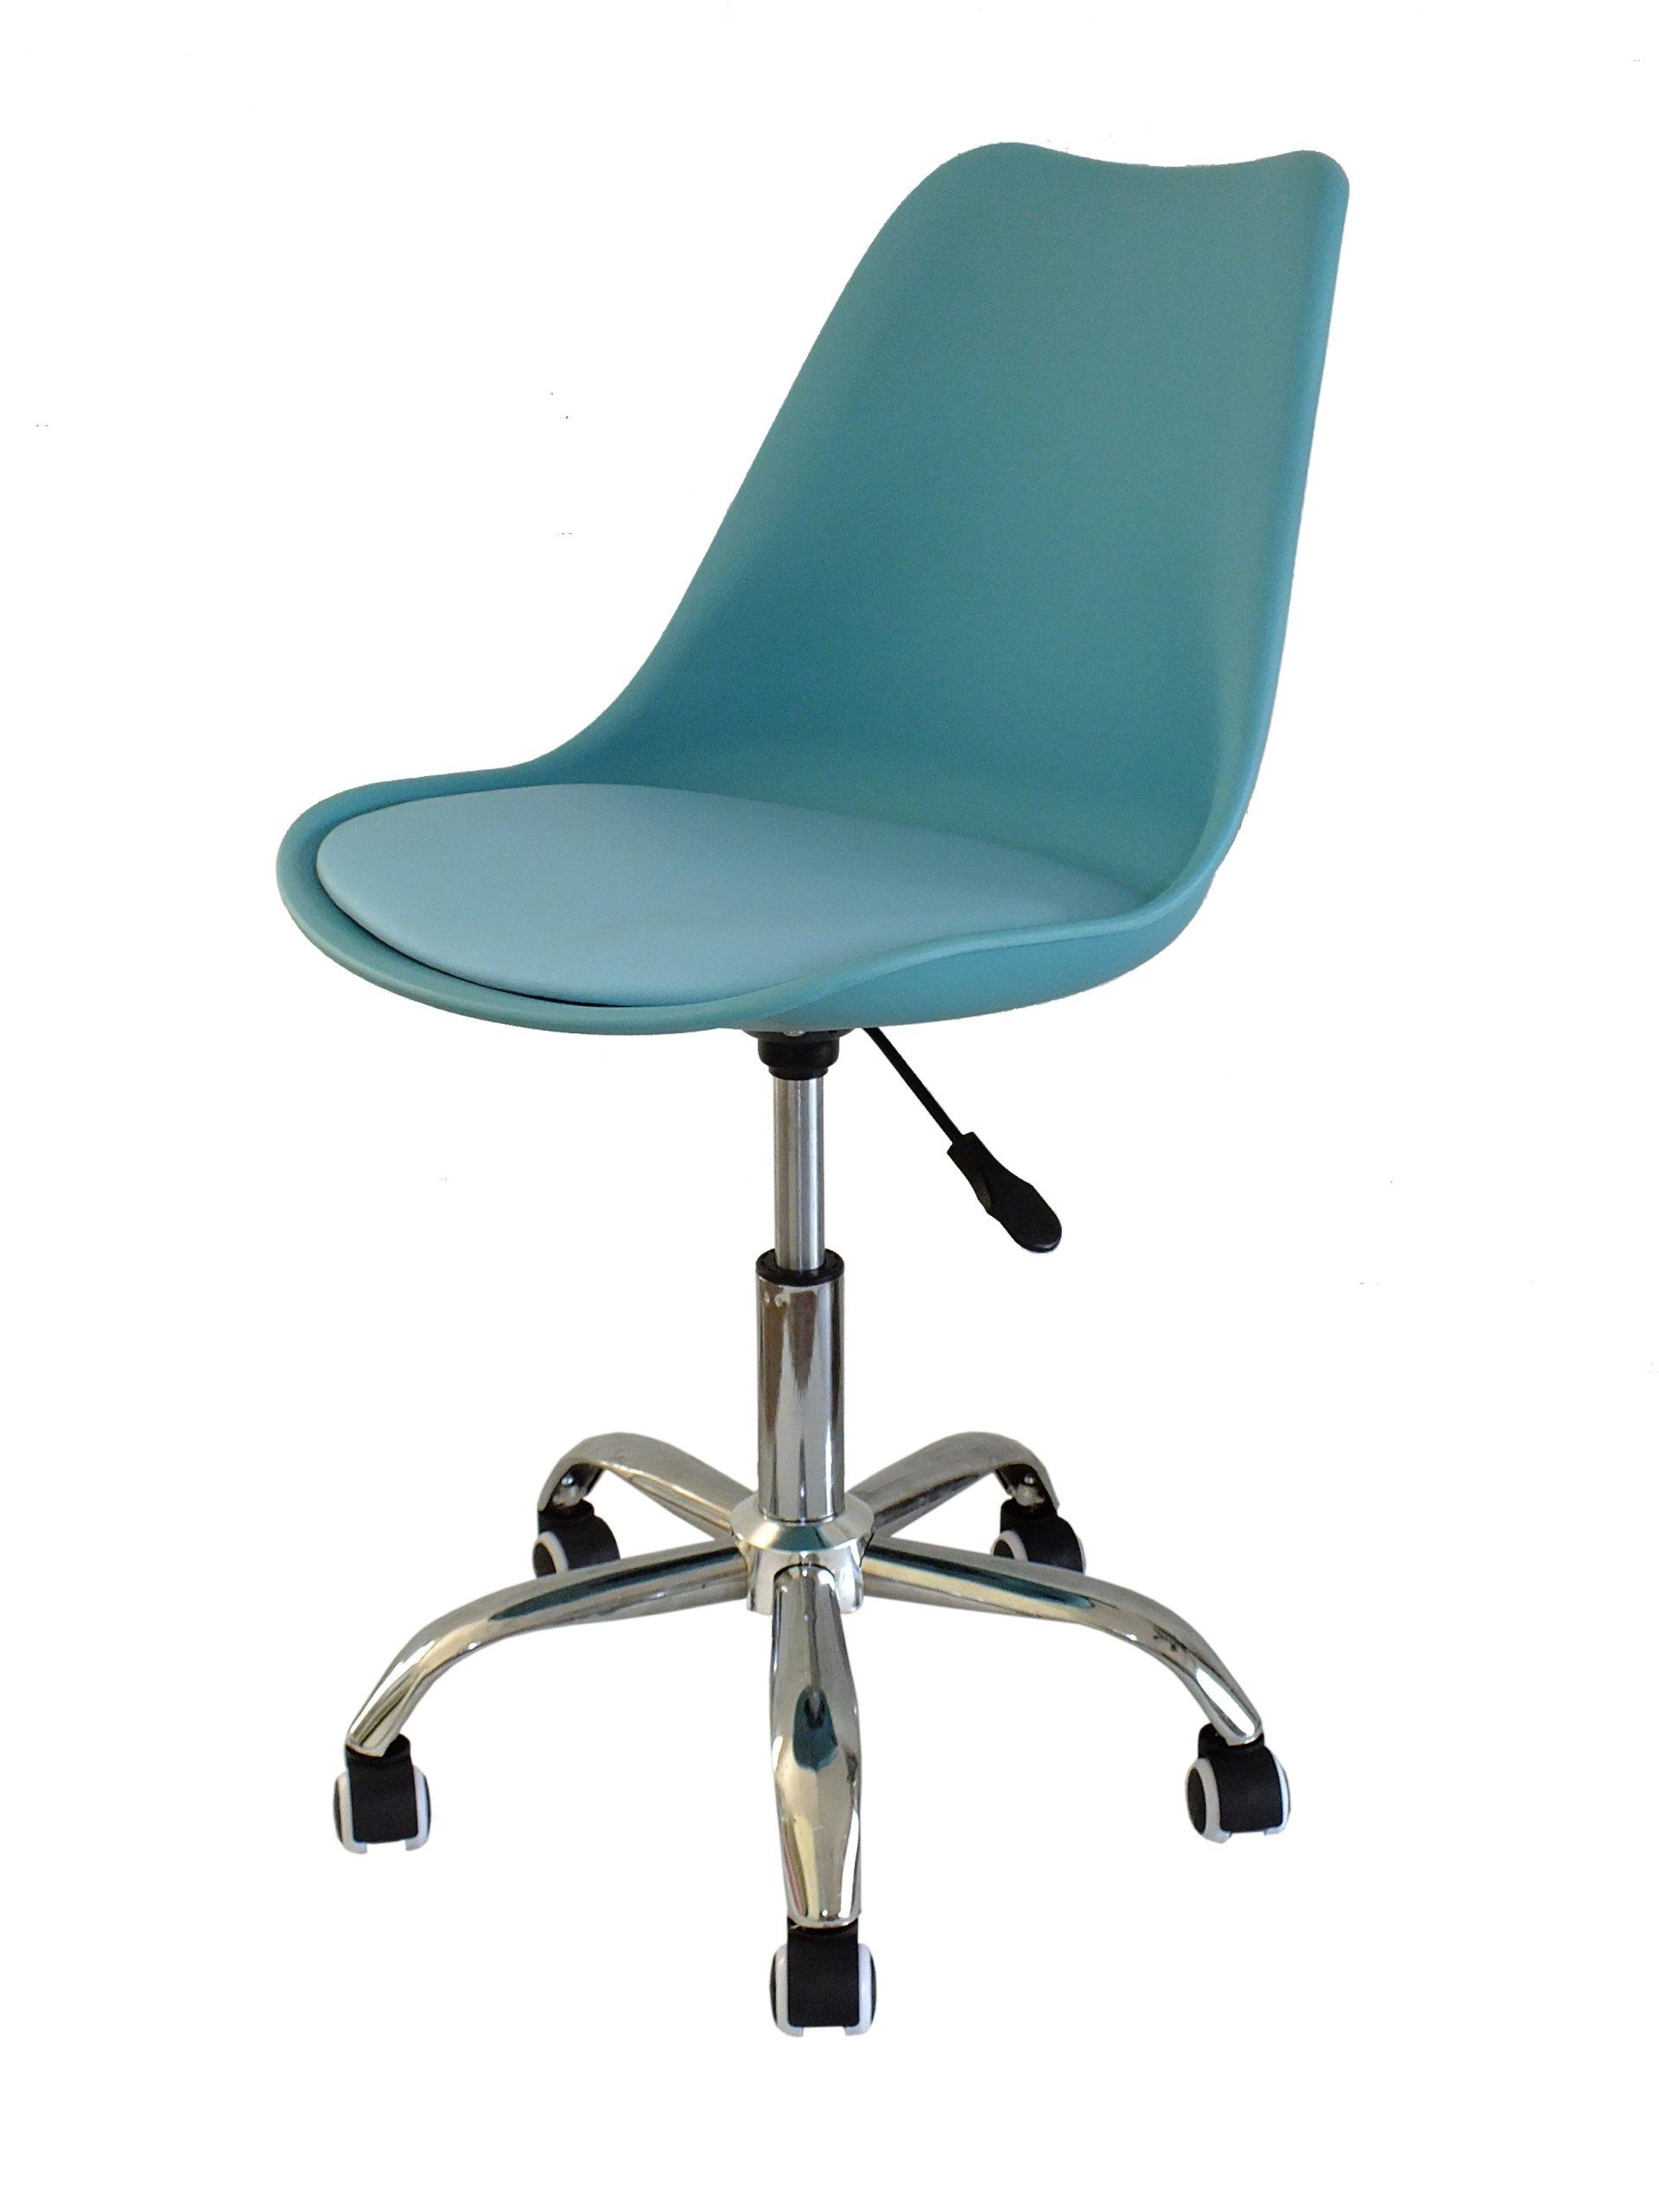 Rysunek CAD 2D Krzesło obrotowe na kółkach z